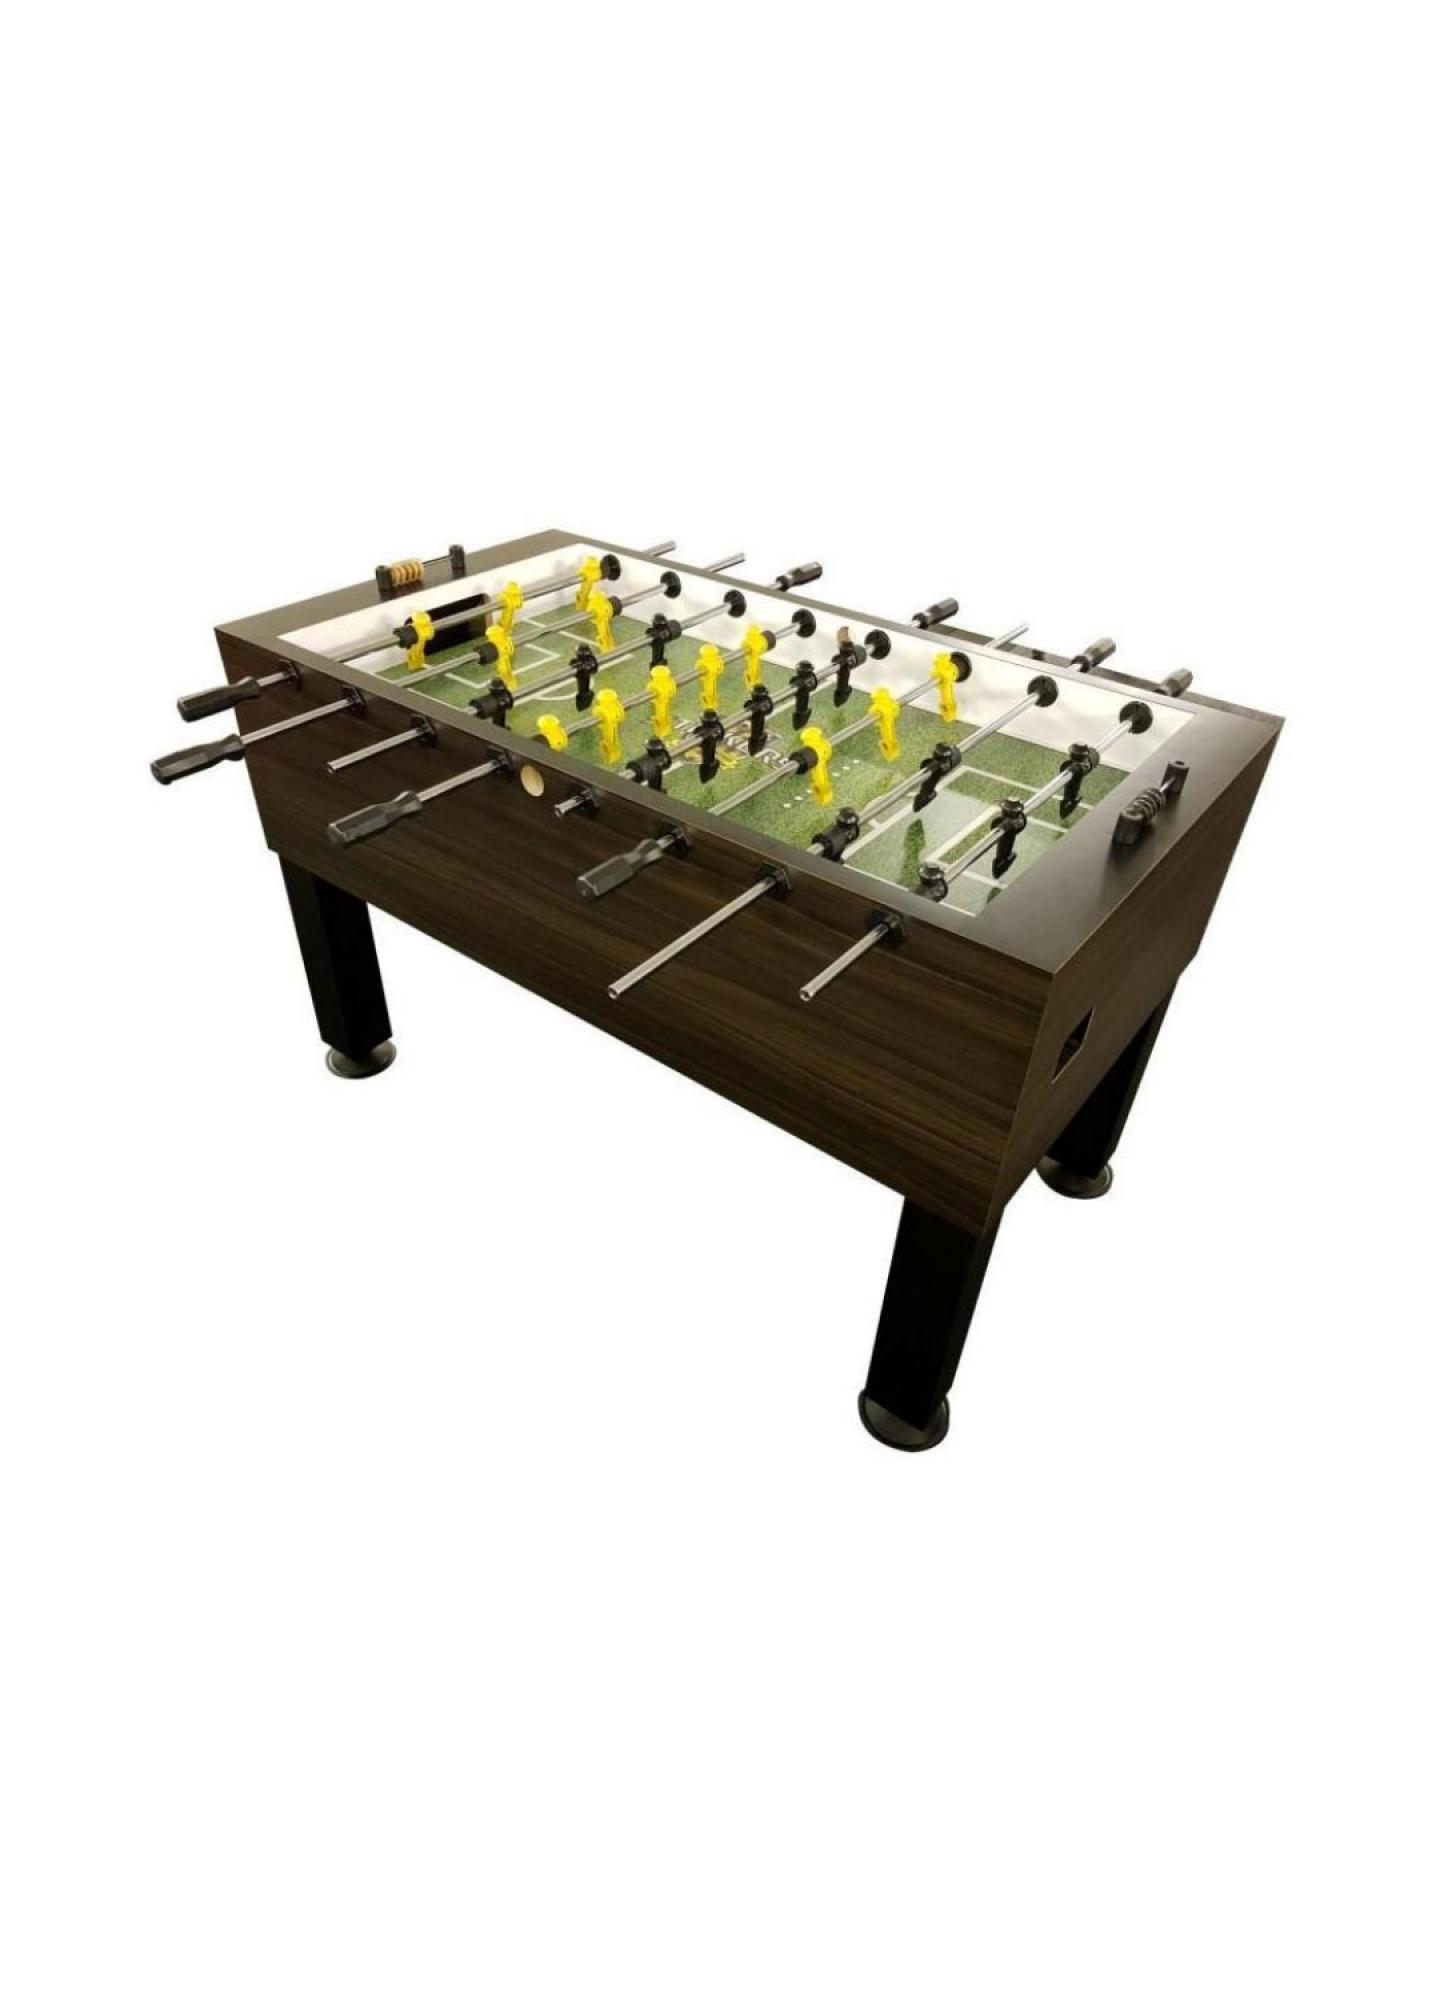 STRIKERS SOCCER TABLE